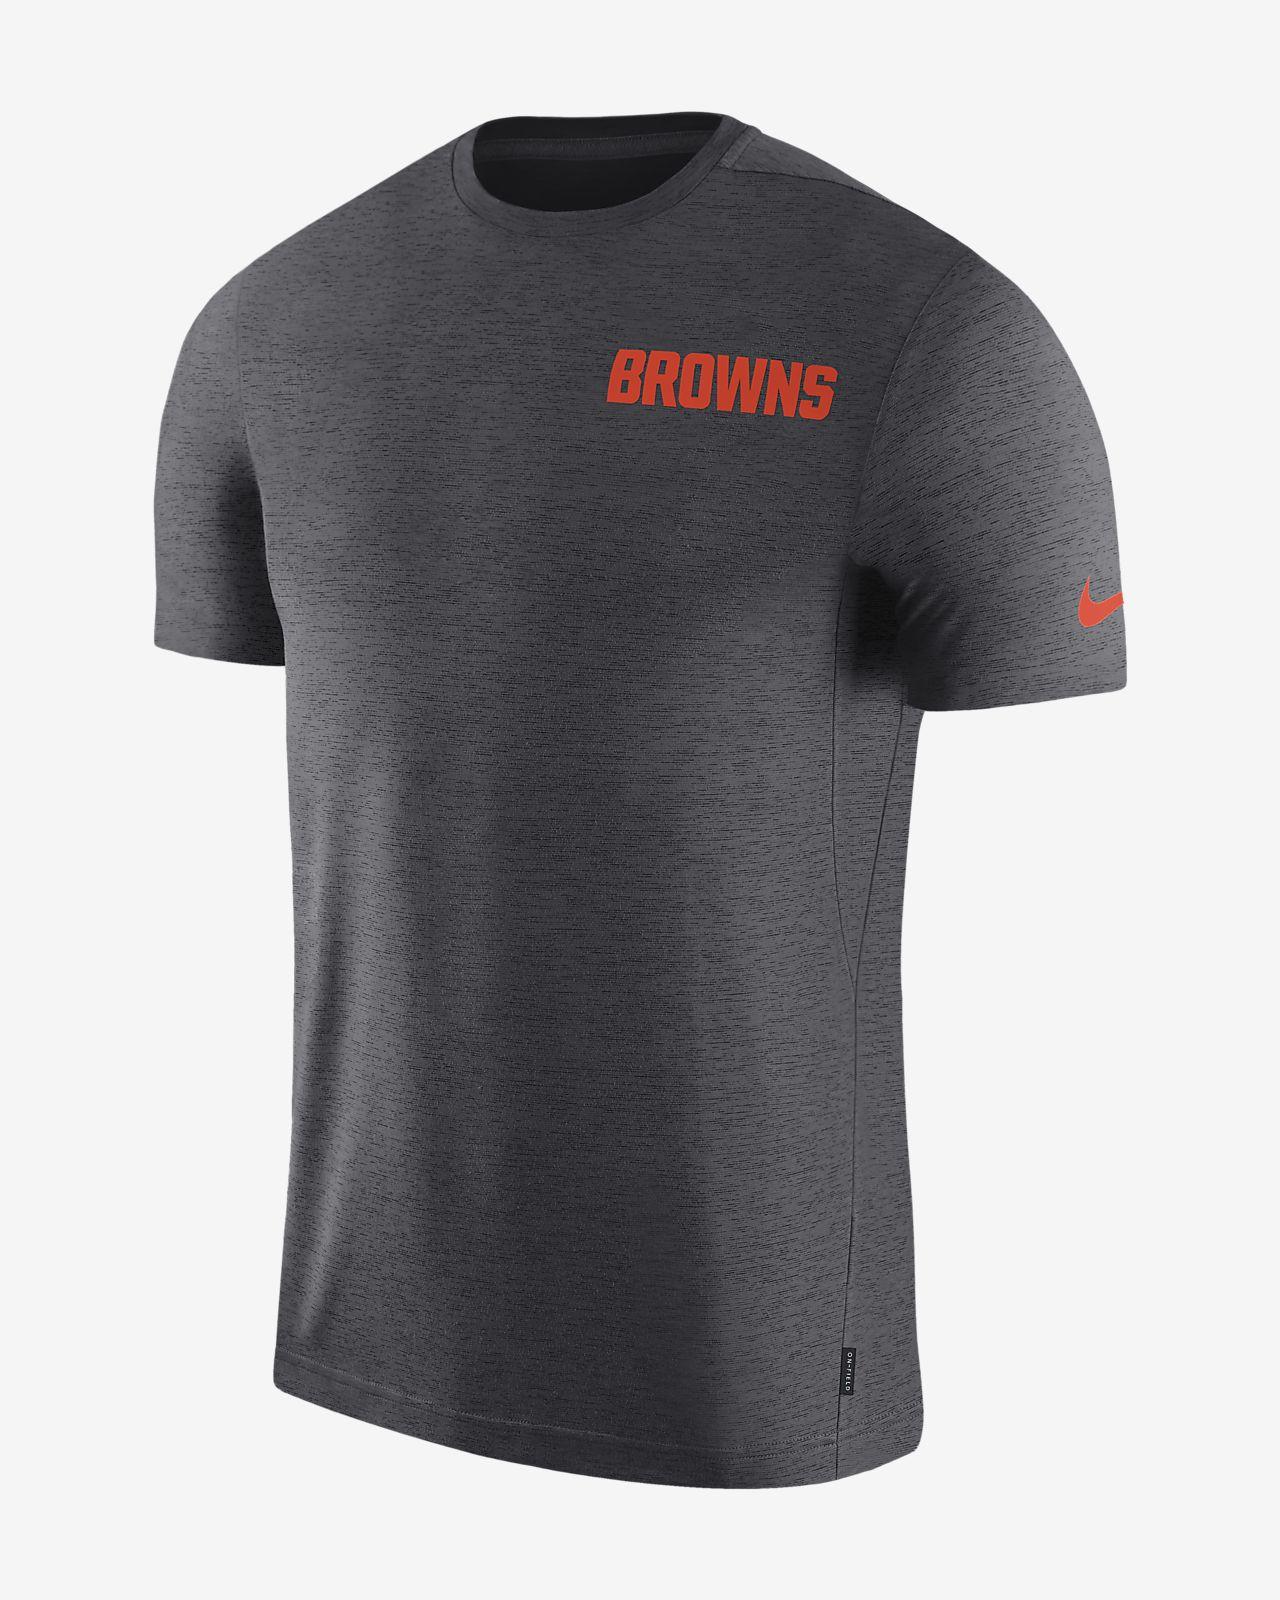 Nike Dri-FIT Coach (NFL Browns) Men's Short-Sleeve Top